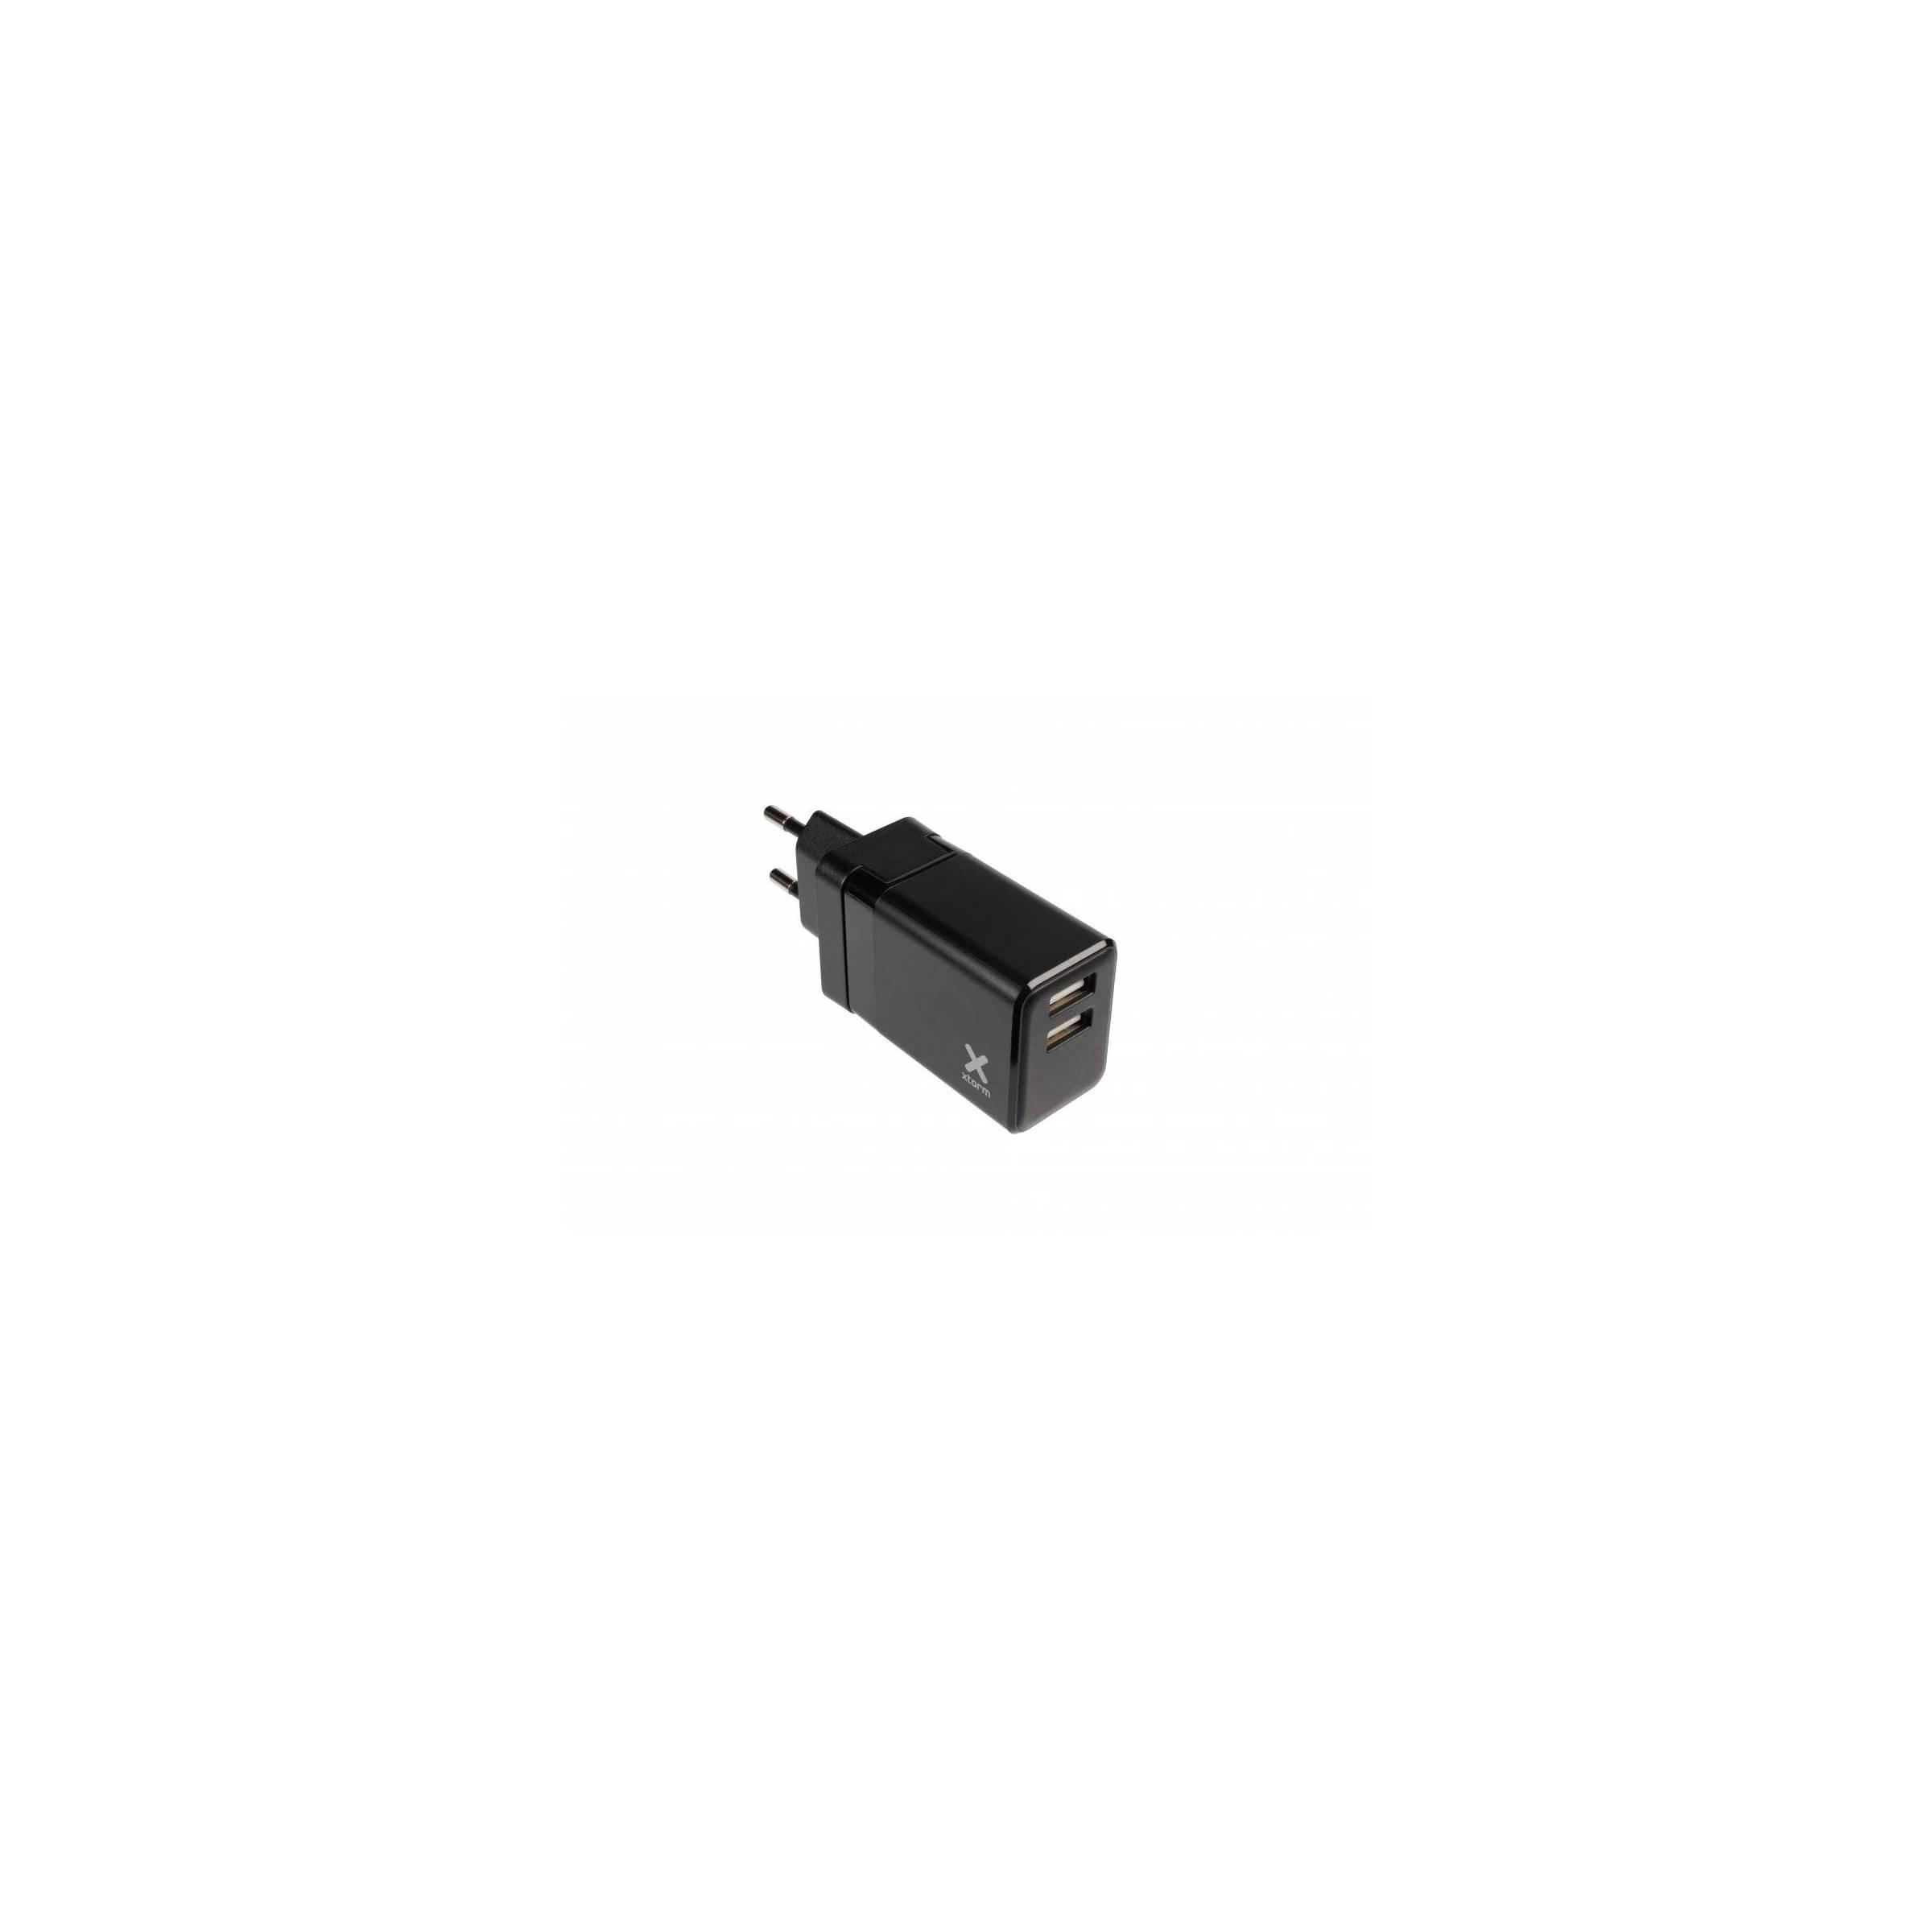 Xtorm 2x usb iphone/ipad oplader 17w fra xtorm fra mackabler.dk